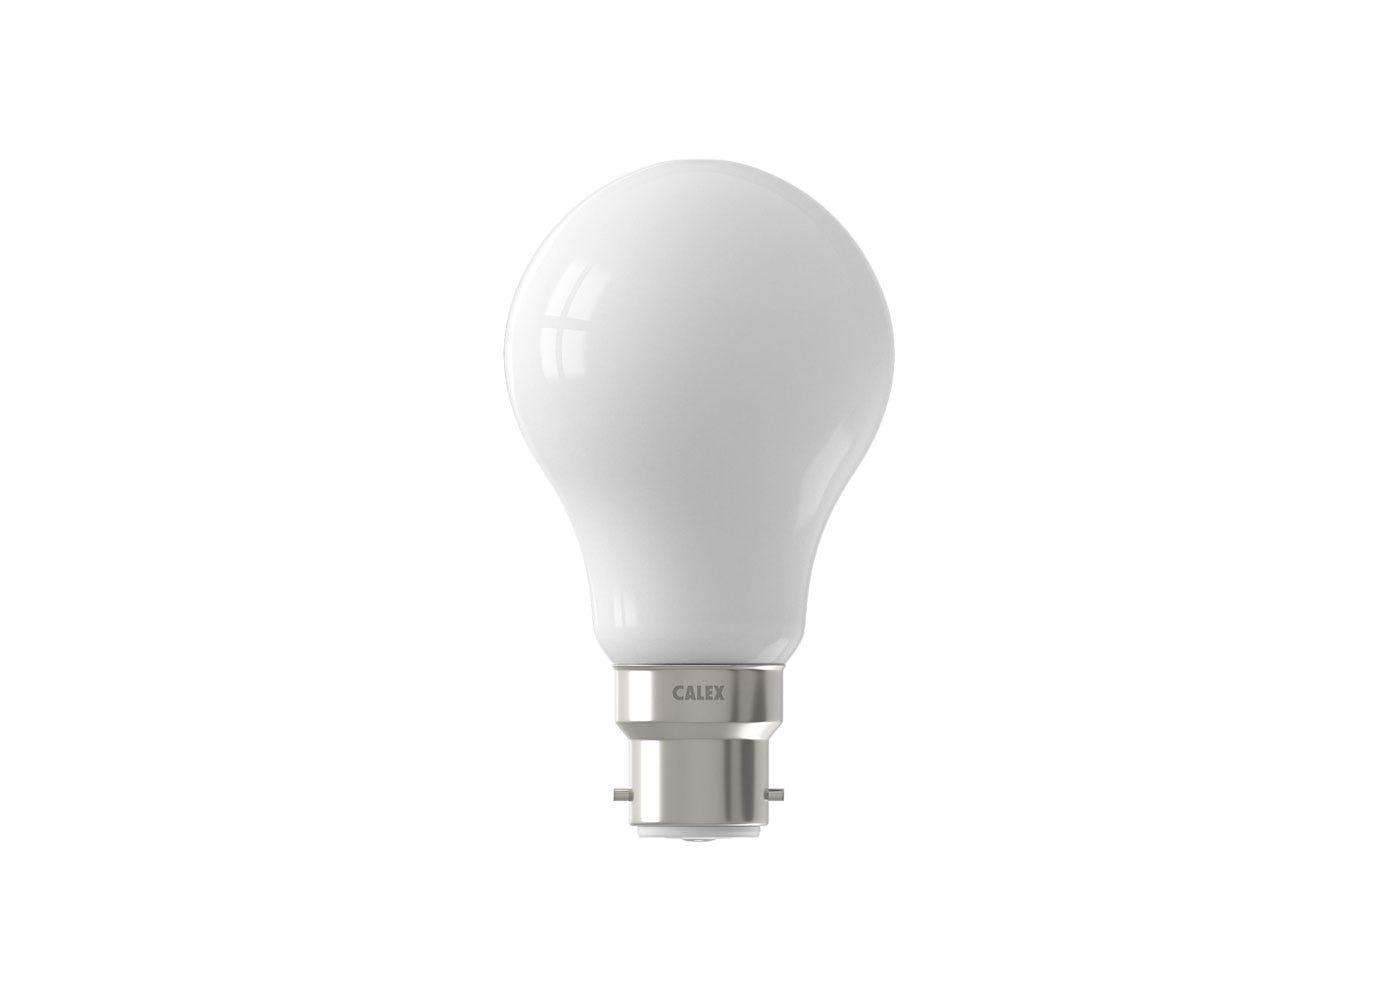 As shown: Smart Standard GLS LED Bulb White 7W B22